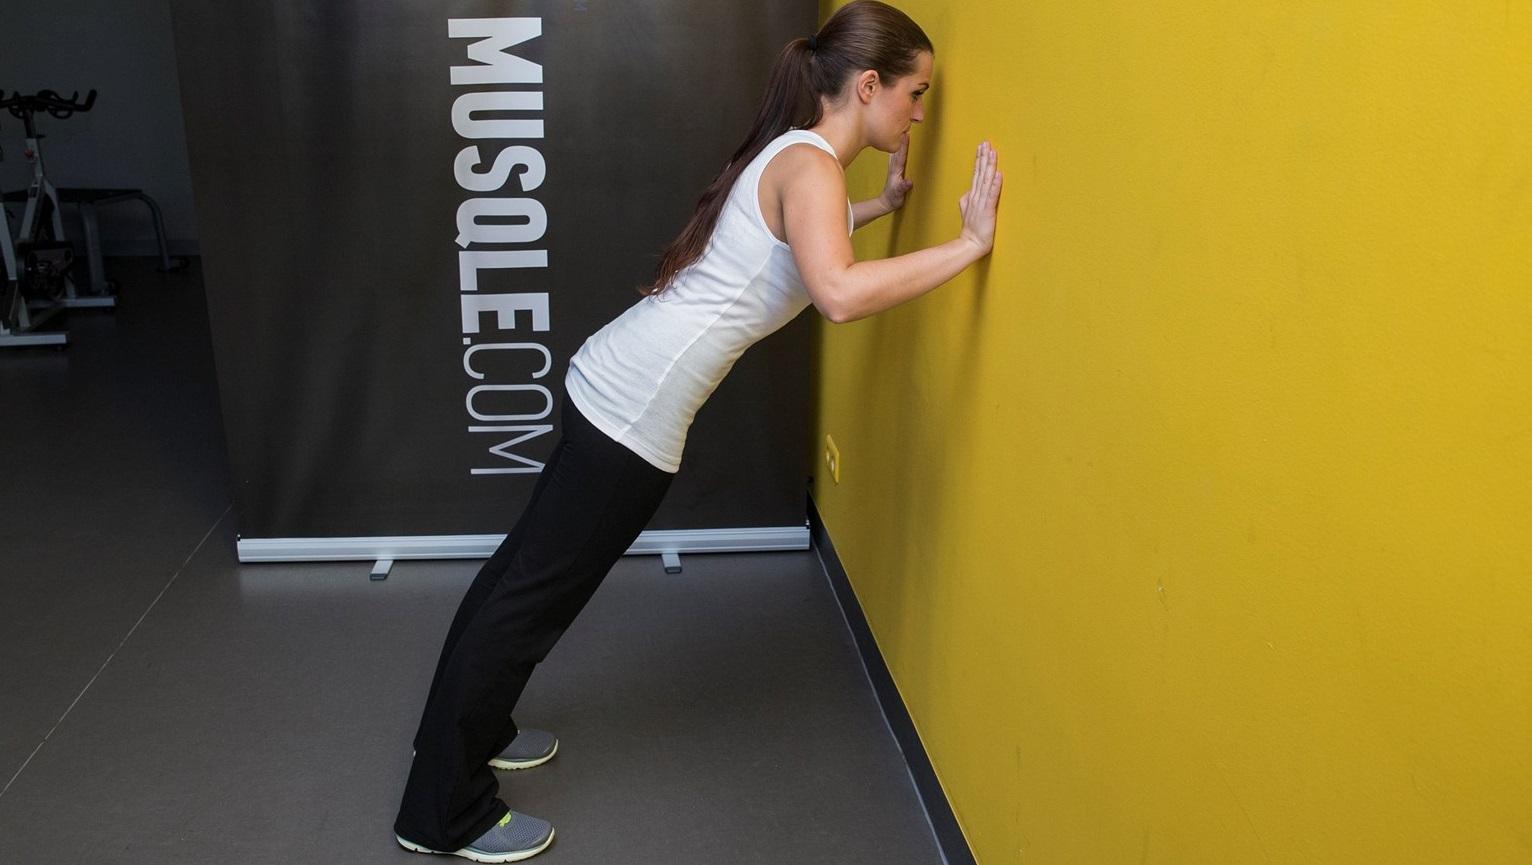 4 exercices anti cellulite pour muscler ses bras cellublue. Black Bedroom Furniture Sets. Home Design Ideas